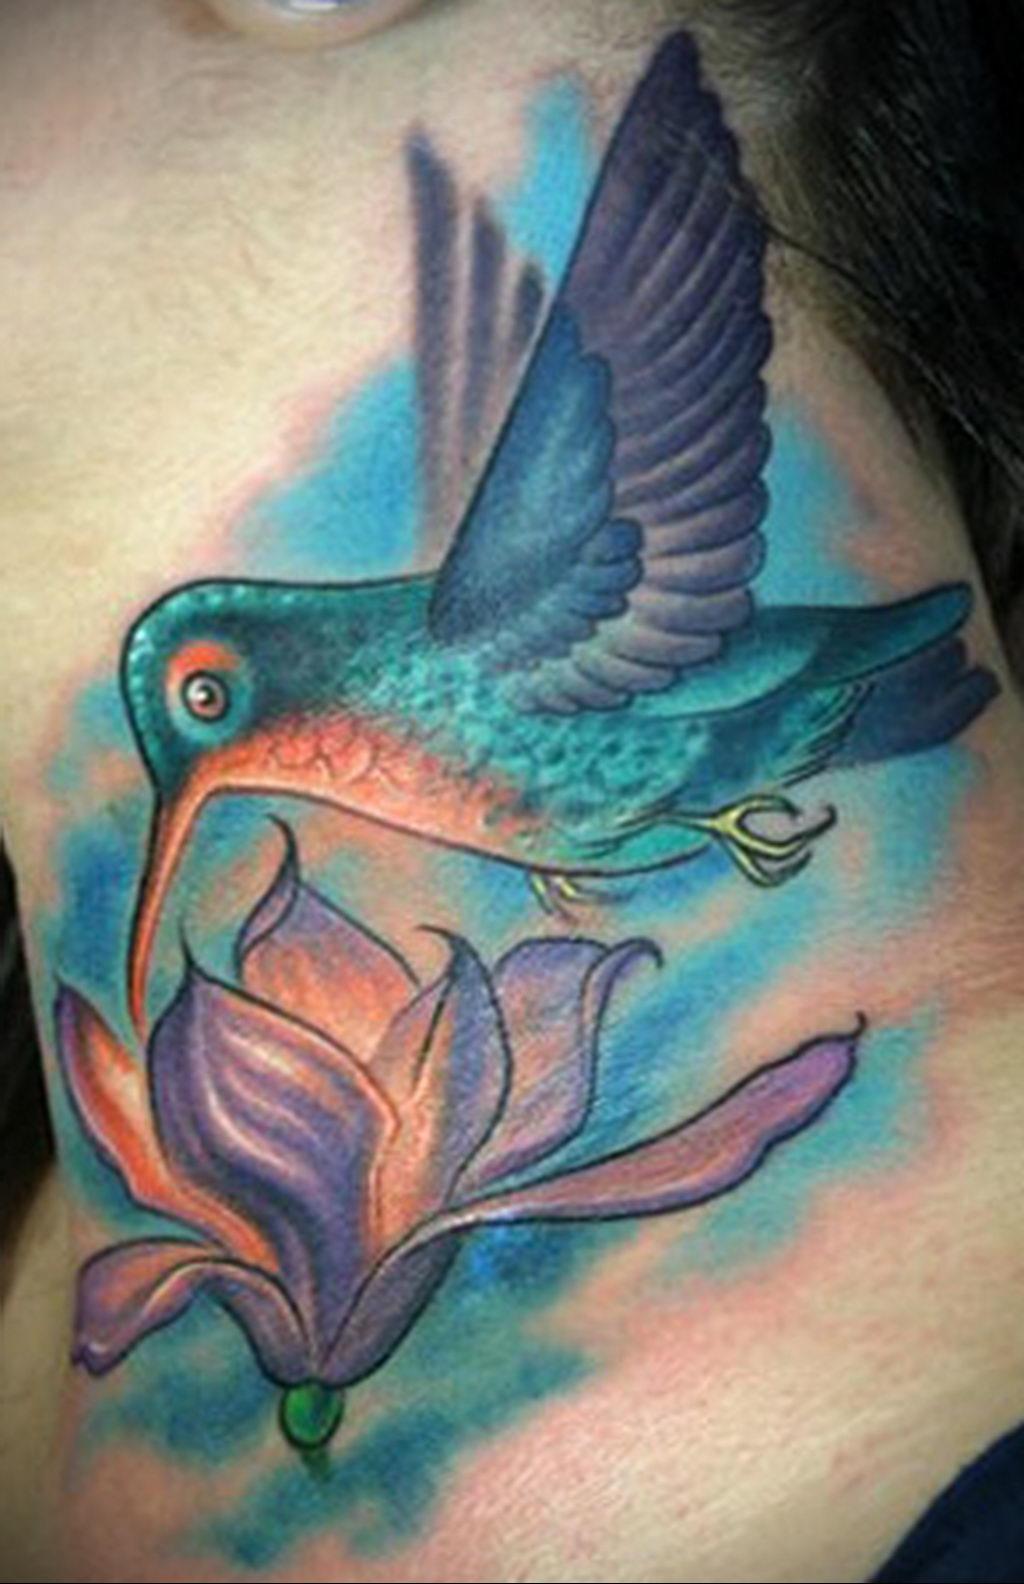 Фото тату про любовь рисунок Птица 03.02.2020 №125 -bird tattoo- tatufoto.com